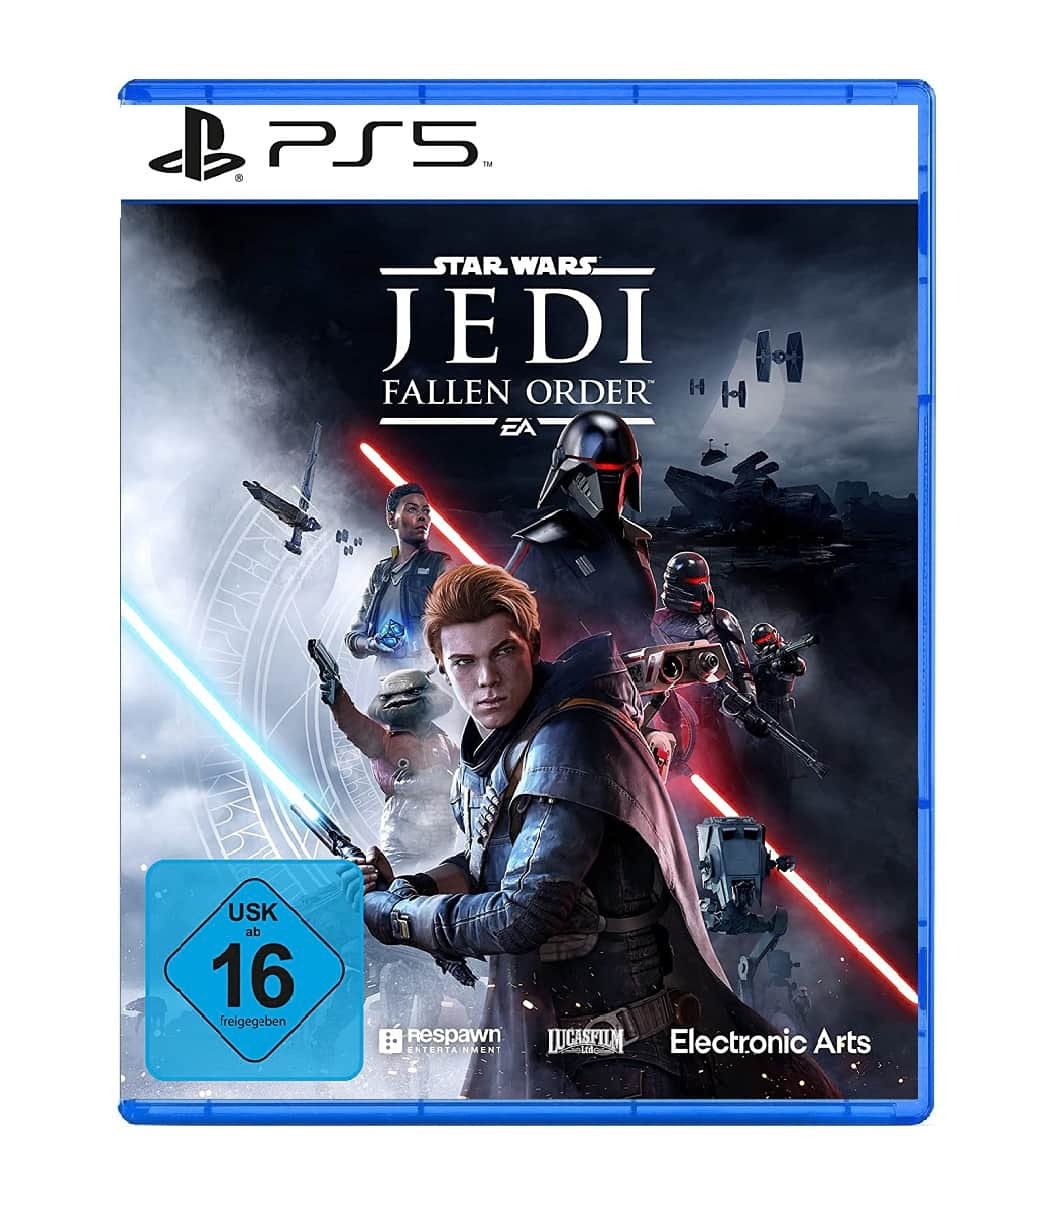 Ps5 Starwars Jedi Fallen Order